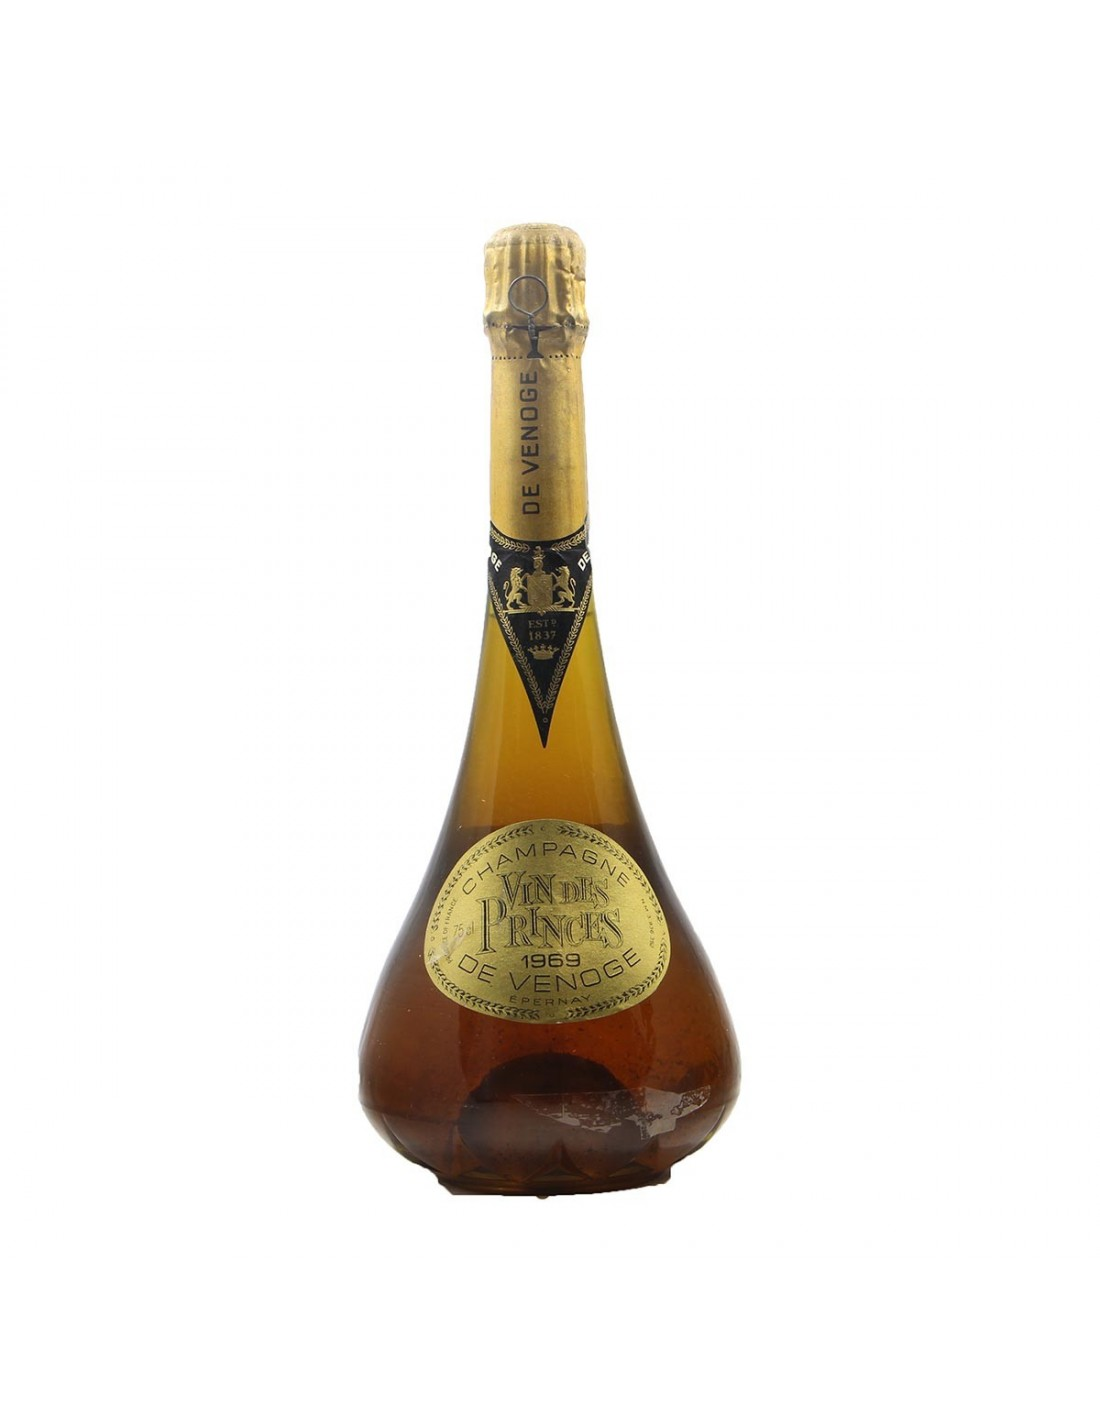 CHAMPAGNE VIN DES PRINCES 1969 DE VENOGE Grandi Bottiglie